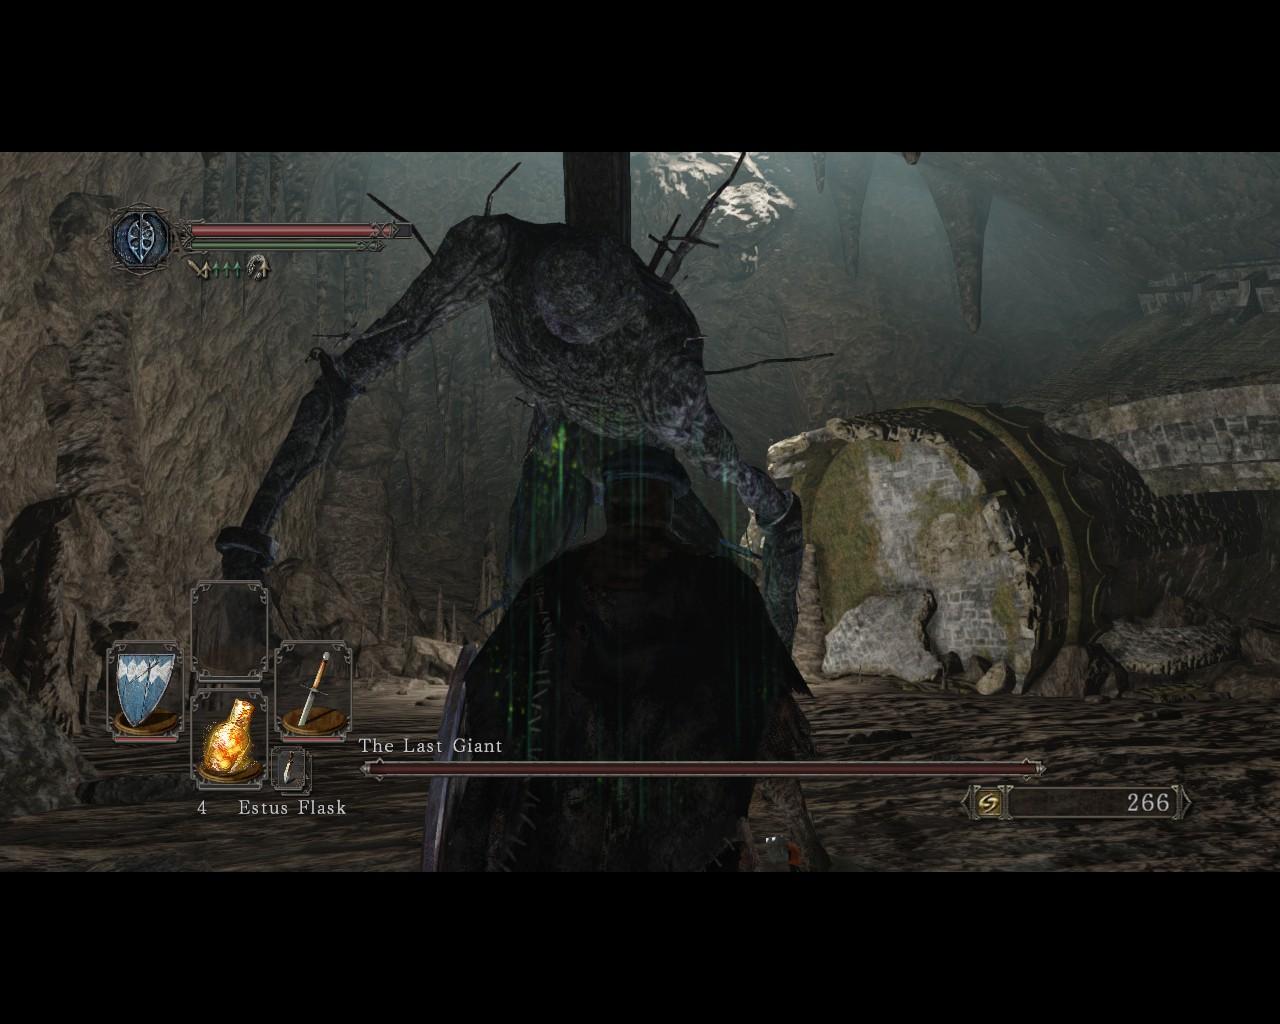 The Last Giant, Dark Souls 2, Hidetaka Miyazaki, 2014